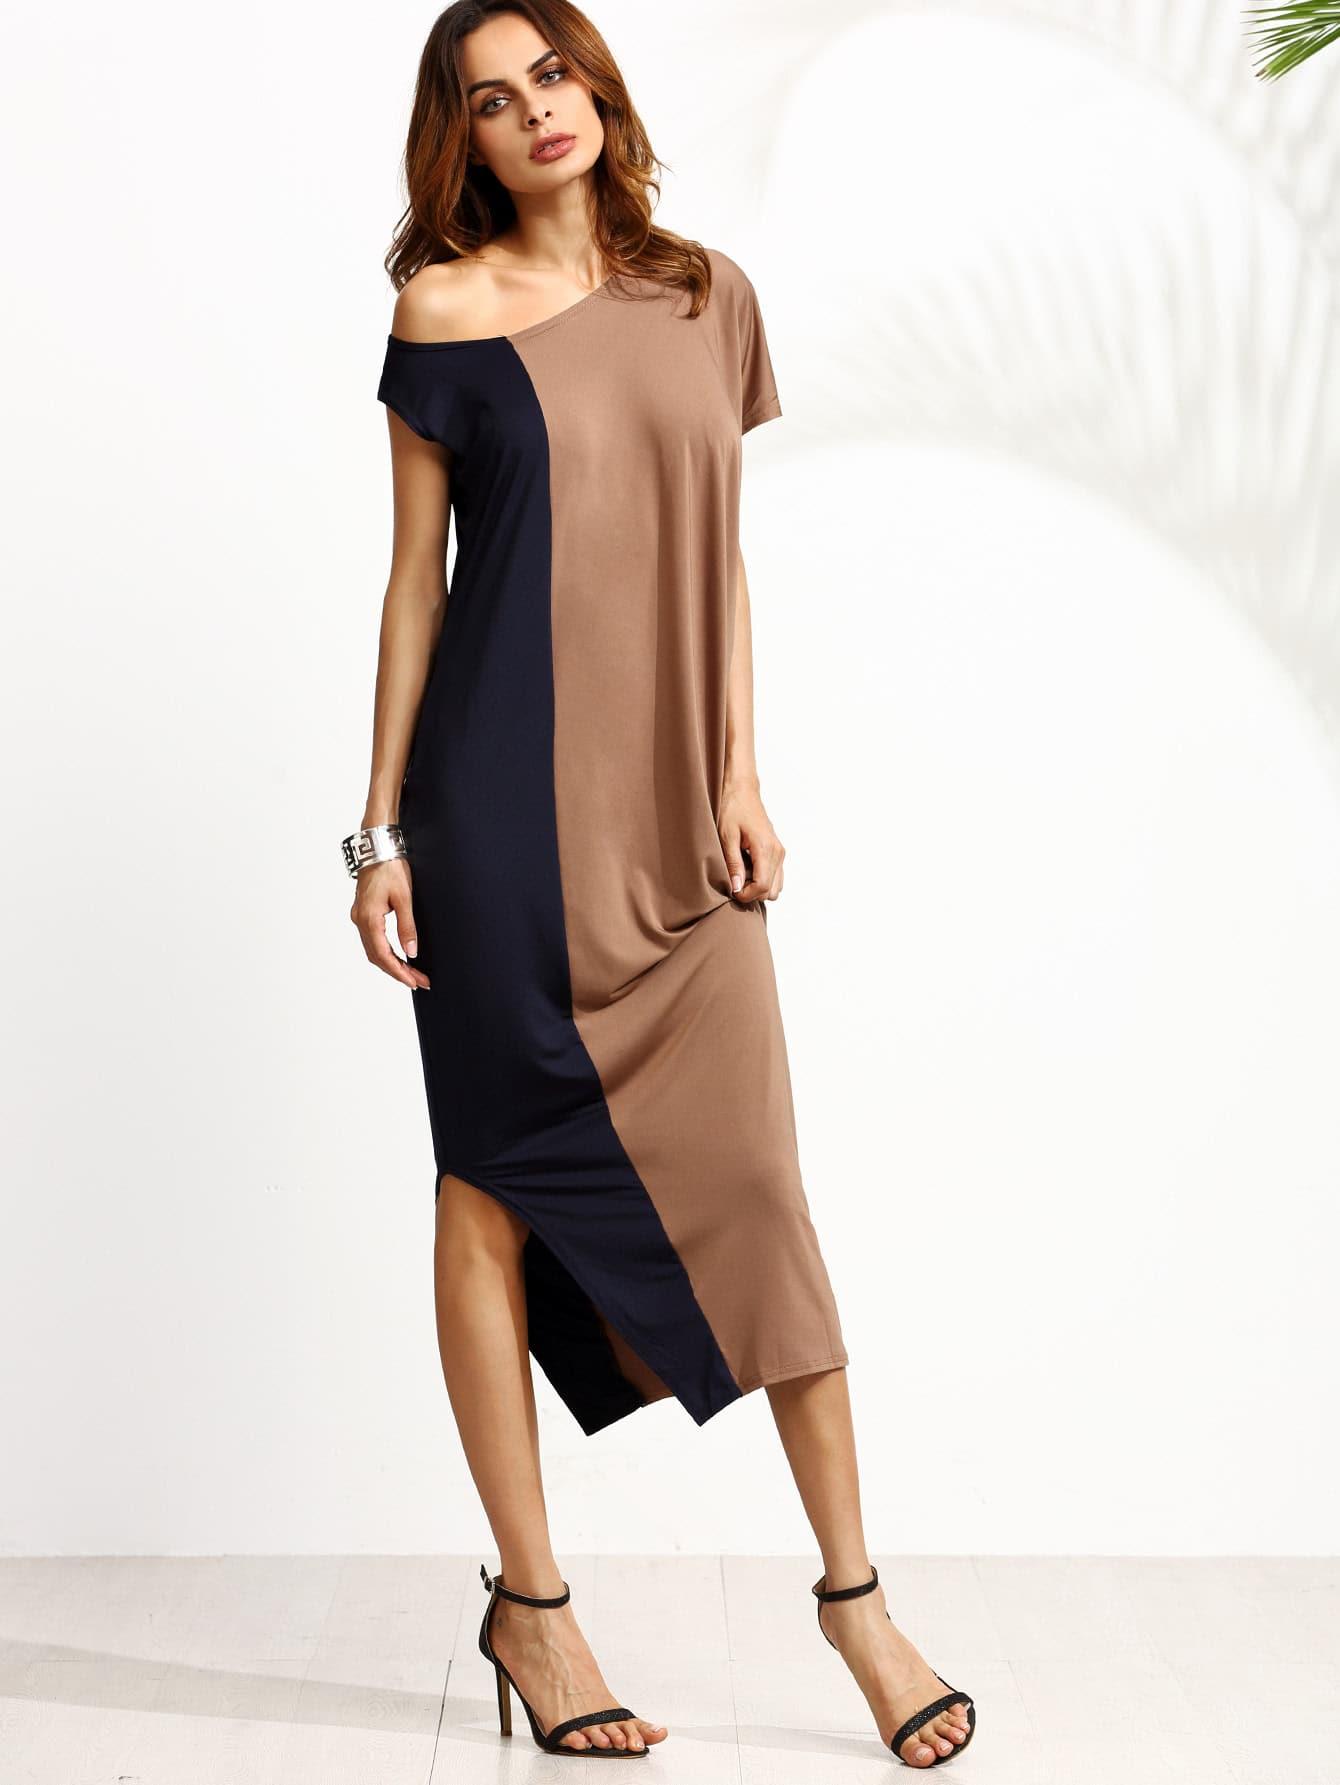 Two Tone One Shoulder Side Split Dress